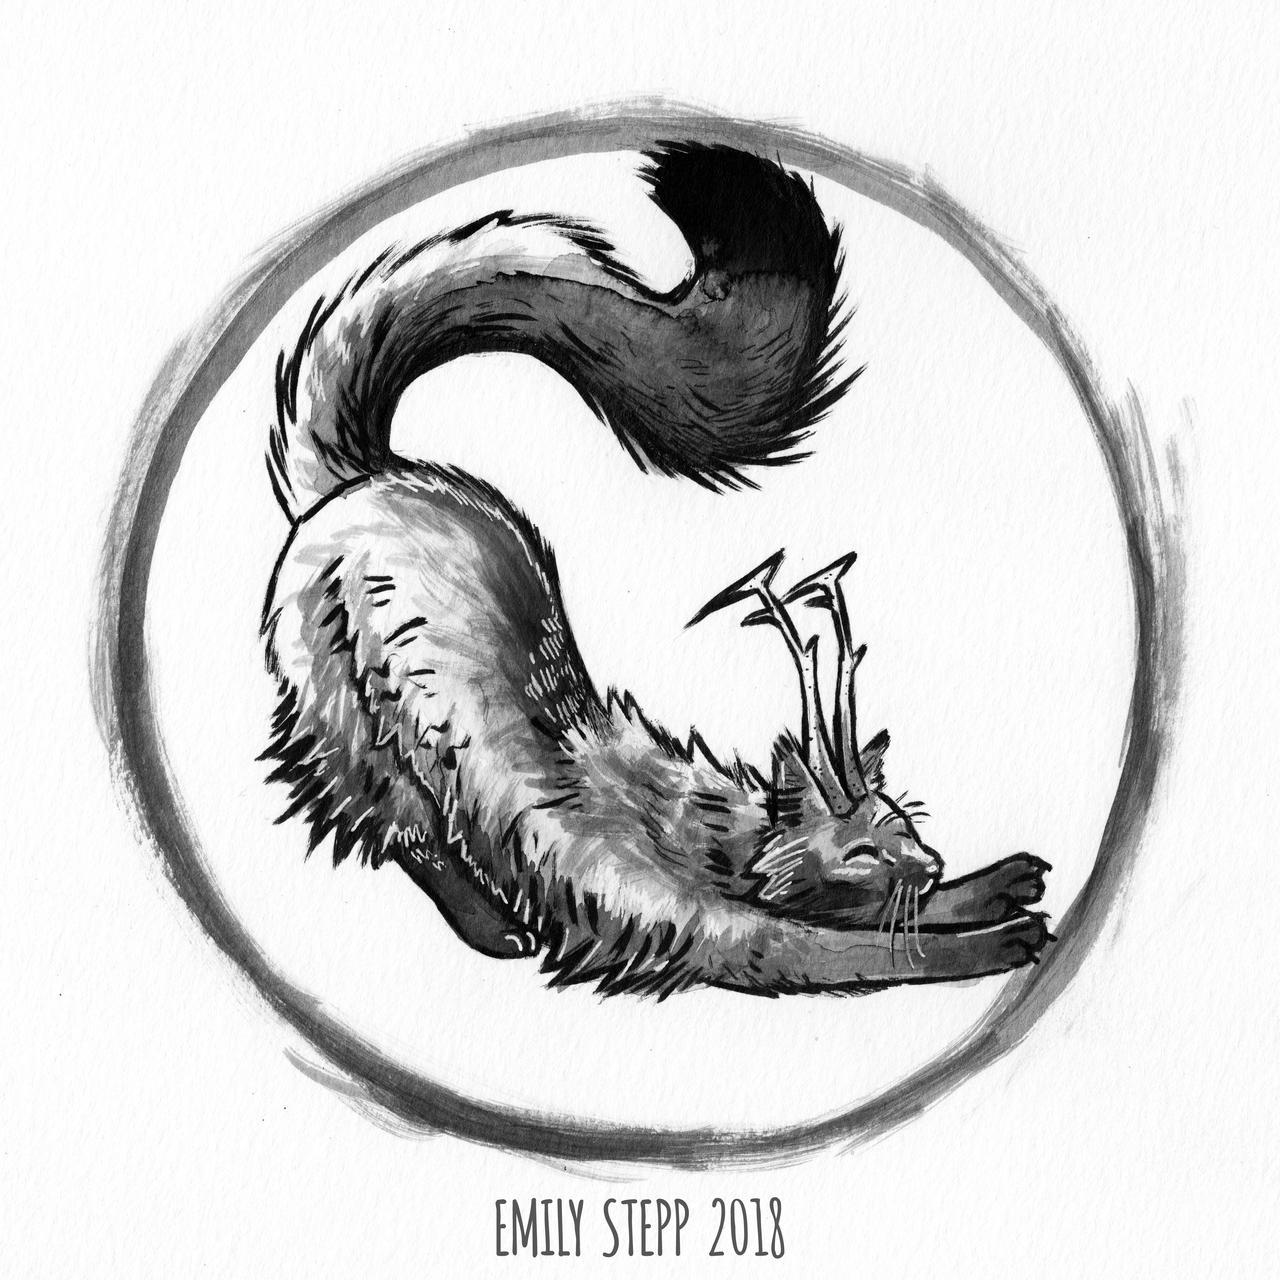 Inktober 2018 Day 26 Stretch by EmilyStepp